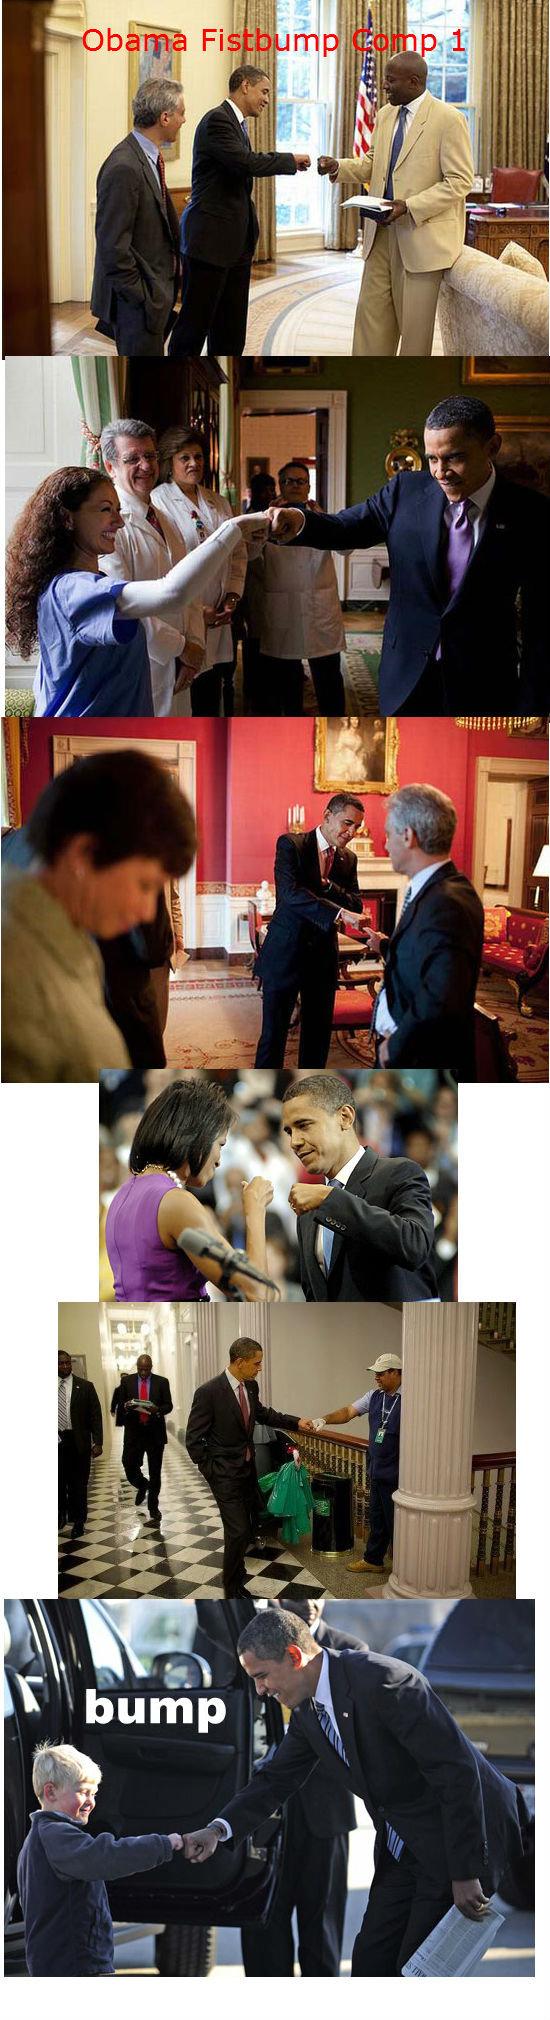 President Obama Fistbump Compilation 1. Like for Obama Fistbump Compilation 2!!. President obama barrack Fistbump bump